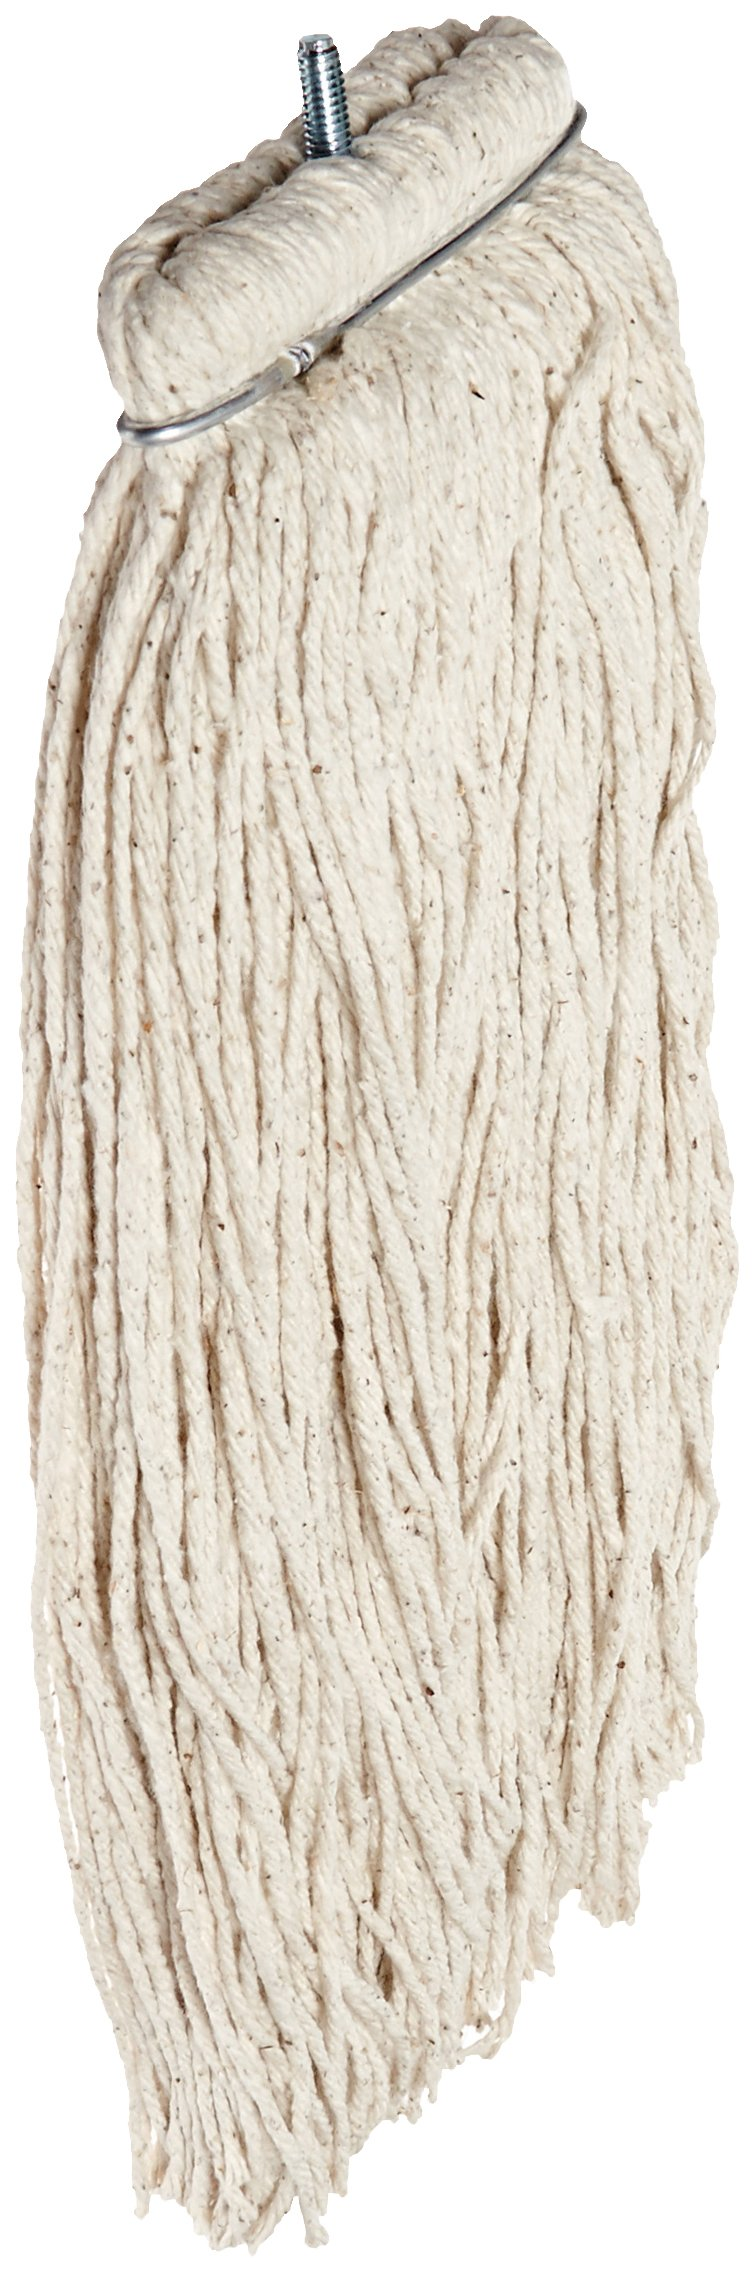 Impact 12120 Layflat Screw Type Cut End Cotton Wet Mop Head, Regular, 20 oz, White (Case of 12)